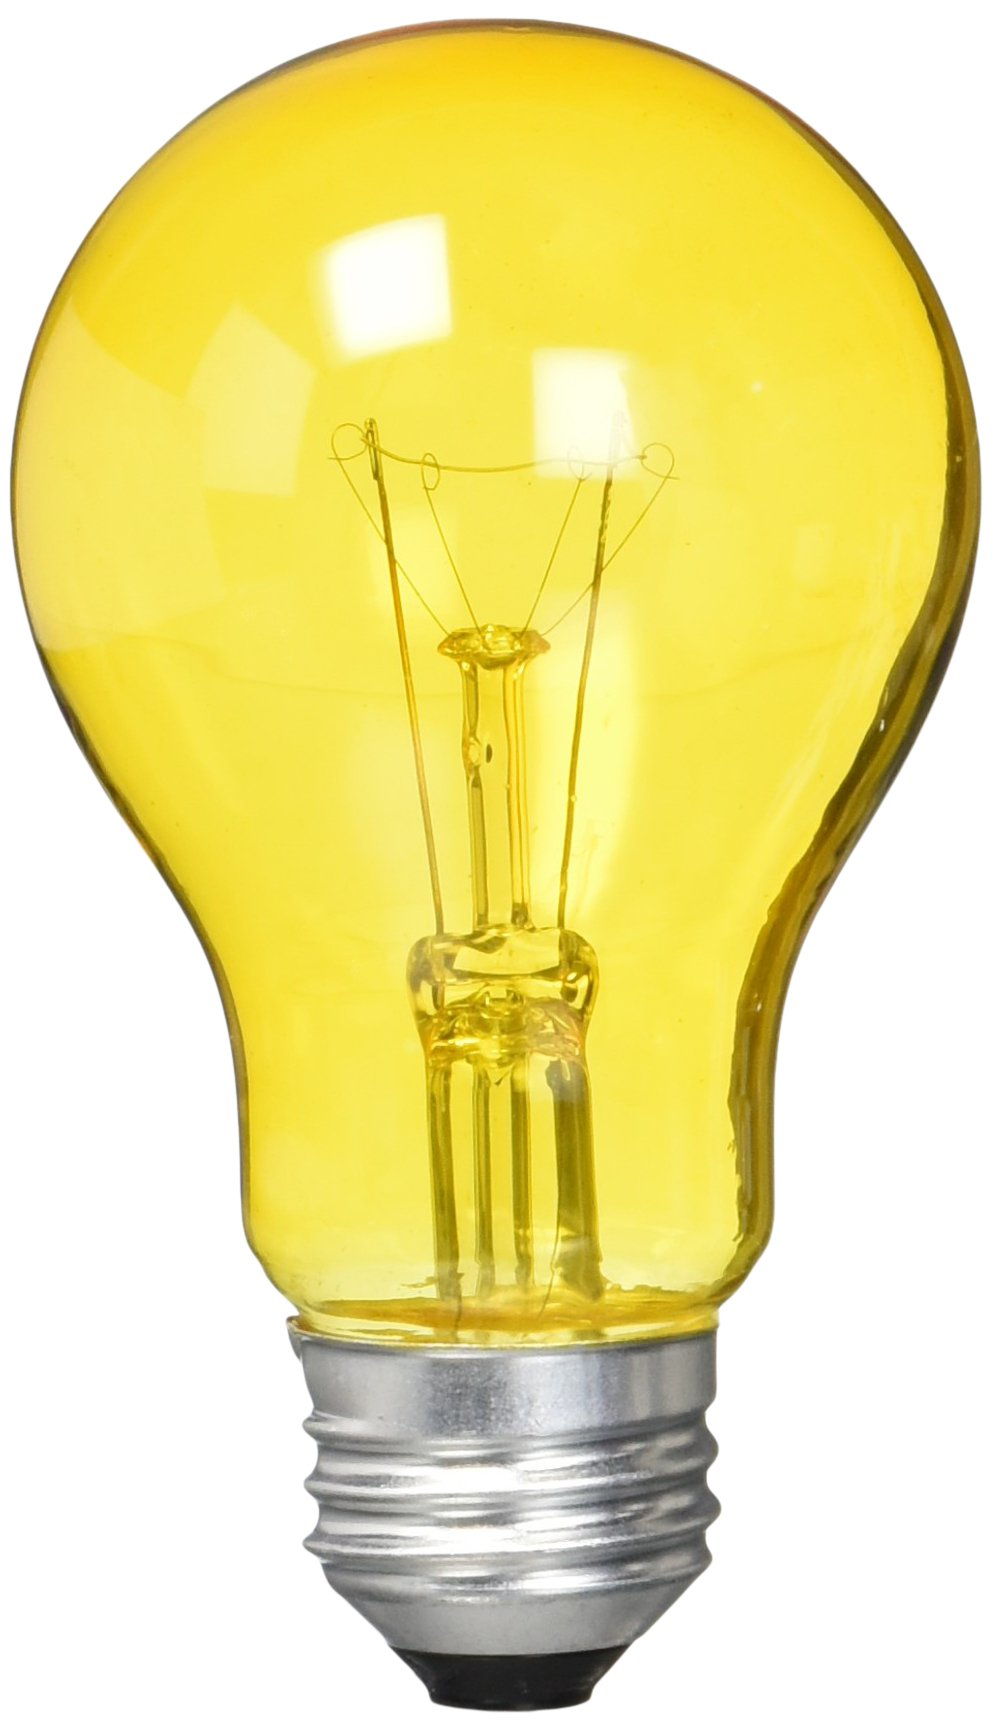 Westinghouse 0344300, 25 Watt, 120 Volt Trans Amber Incandescent A19 Light Bulb - 2500 Hours